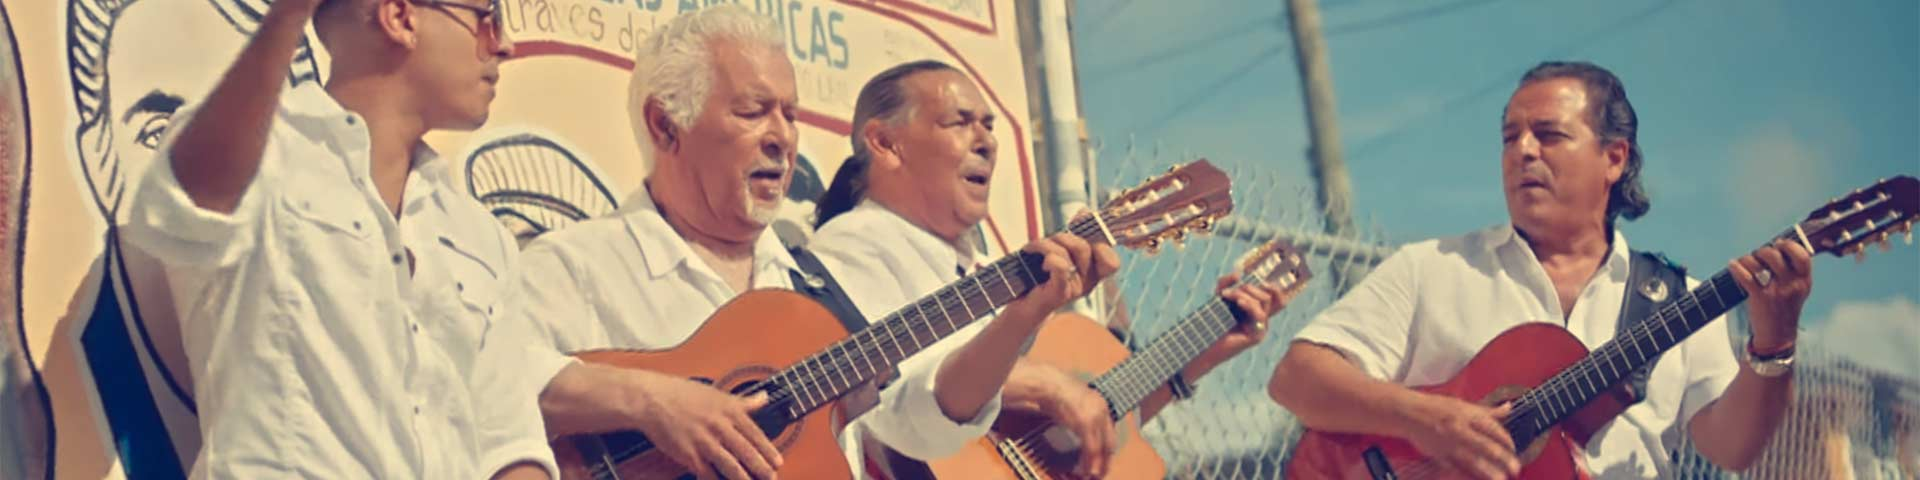 Gipsy Kings & Chico - La Guapa